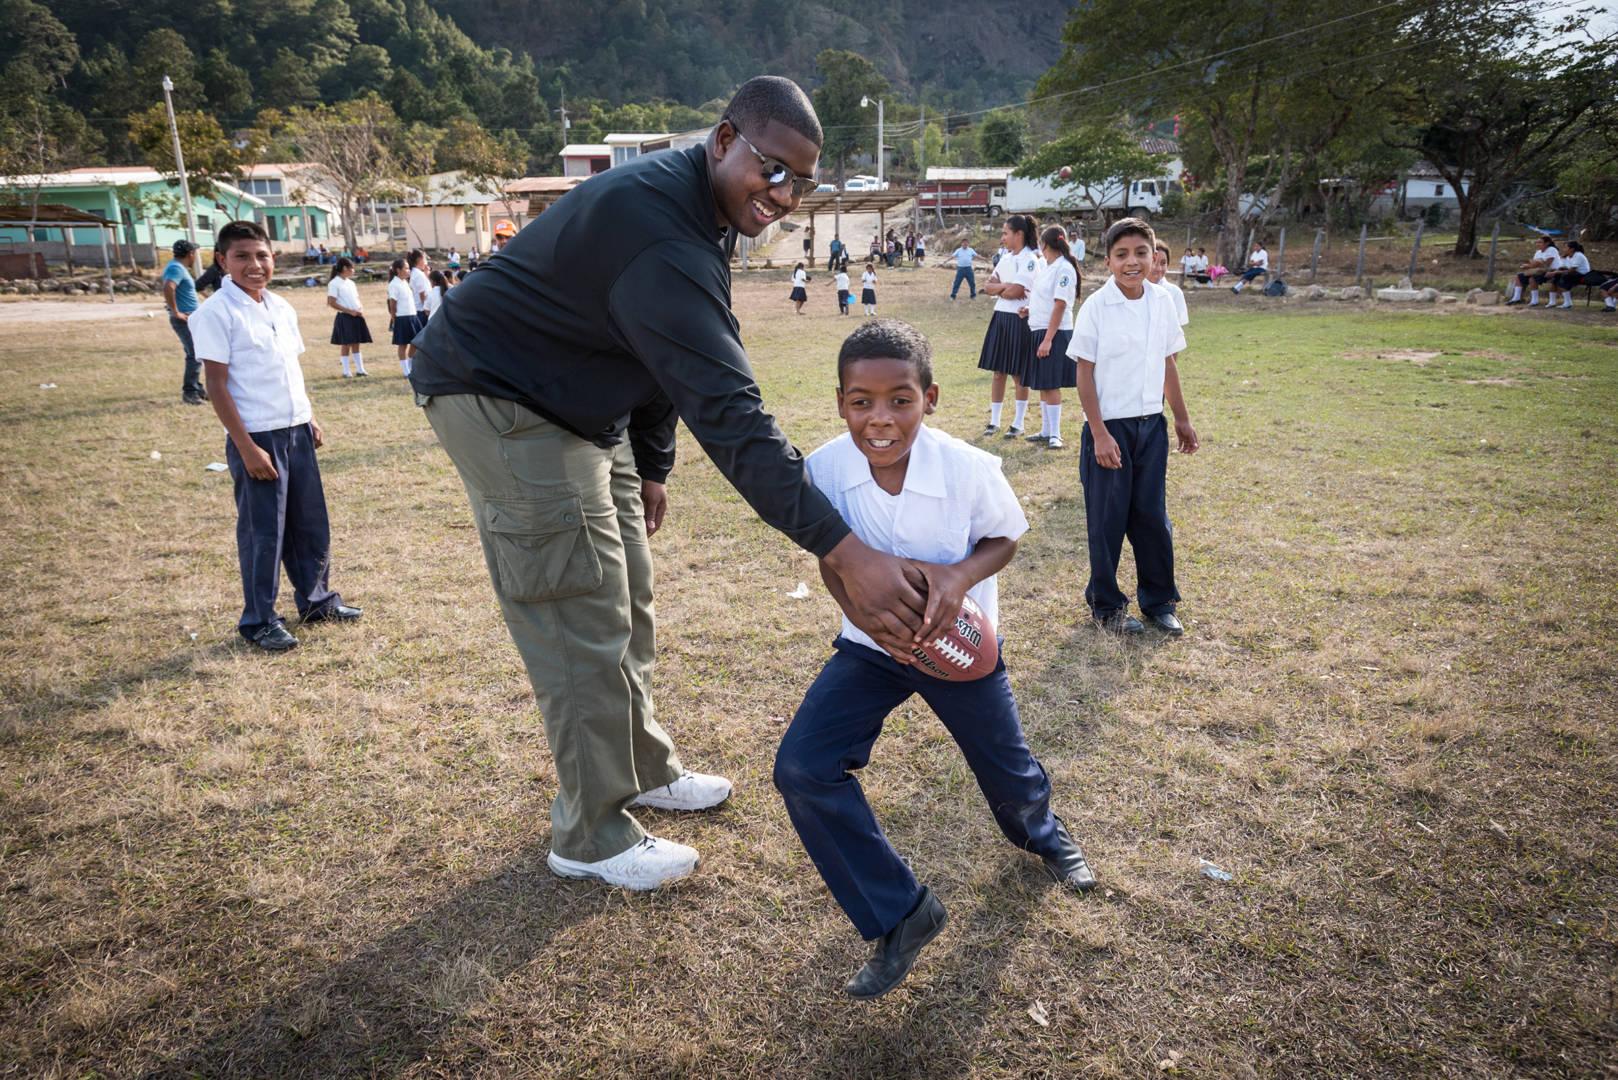 NFL player Kelvin Beachum, Jr. plays American football (Fútbol Americano) with students from World Vision's Agua Blanca project and peer-to-peer tutoring program in San Juan, Honduras.